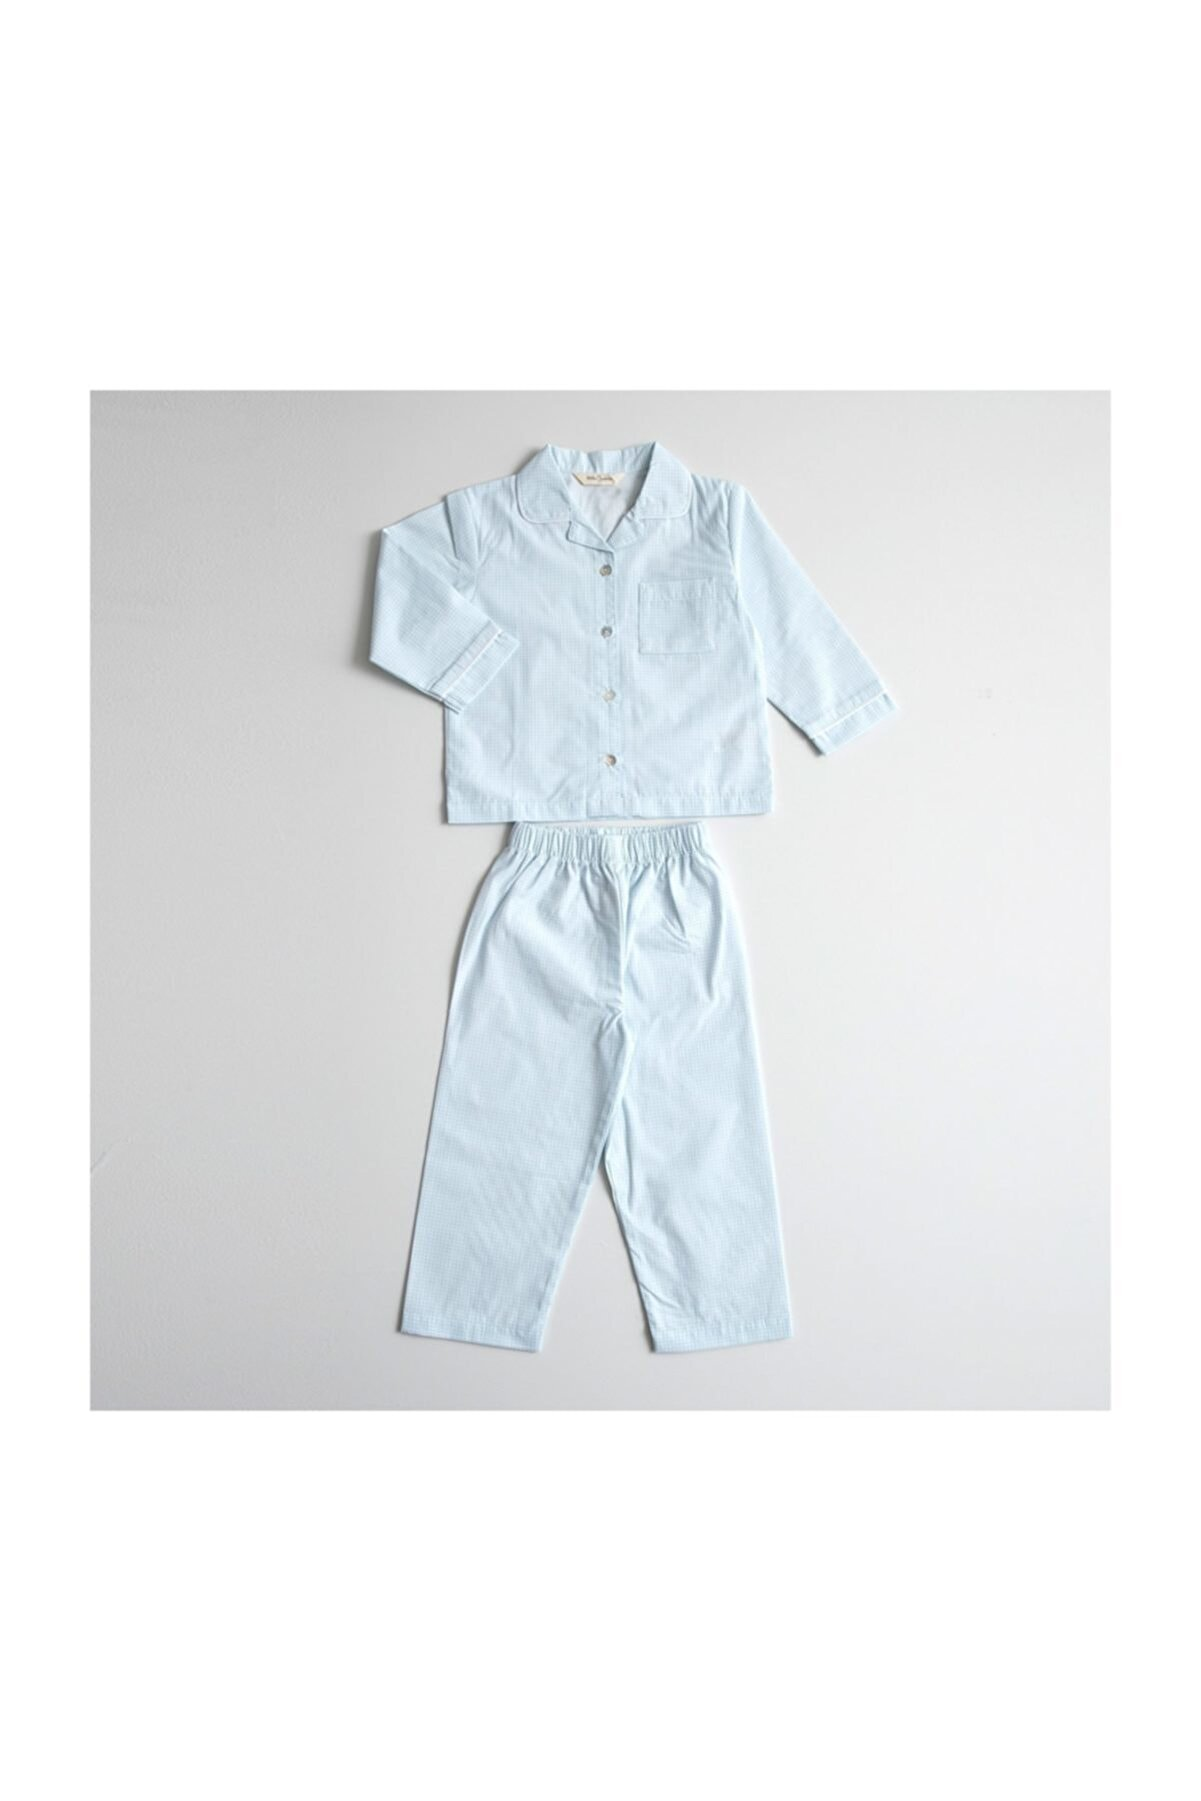 Chakra Mavi-Beyaz Artur Uzun Kollu Pijama - 5-6